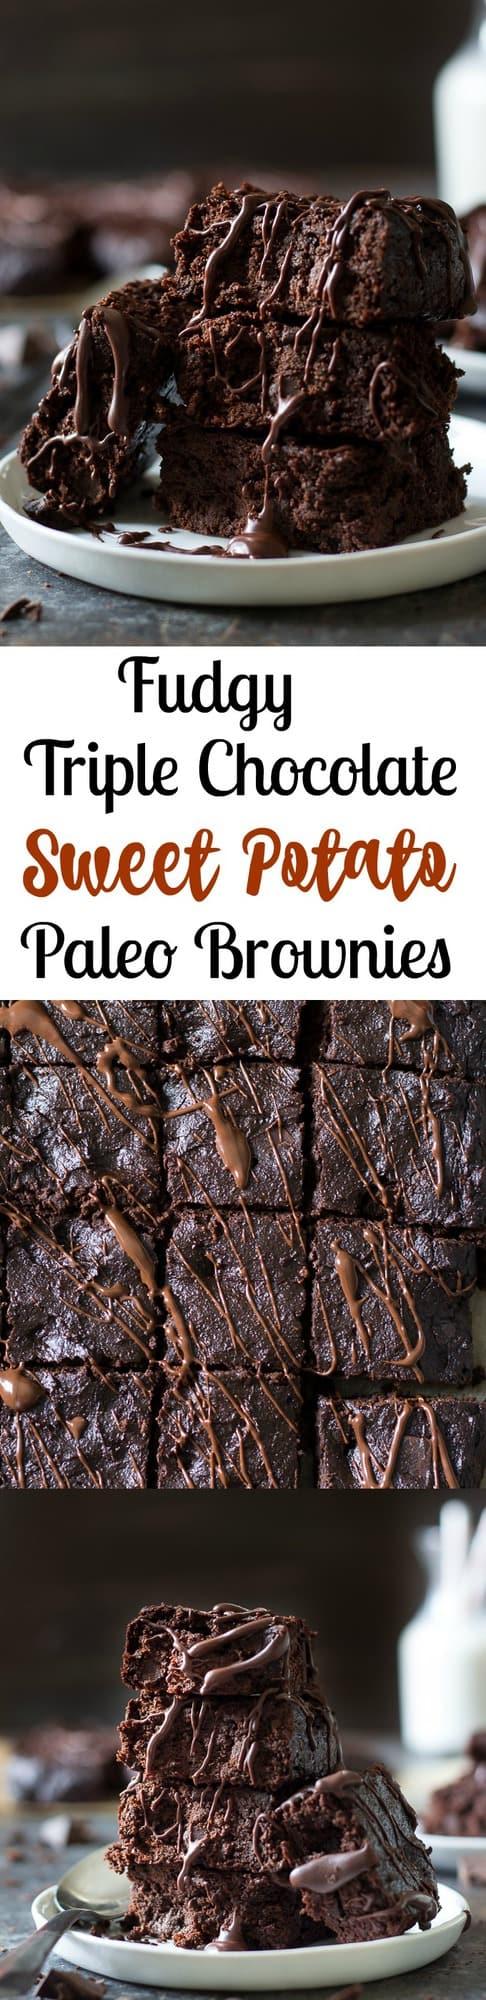 fudgy-paleo-sweet-potato-triple-chocolate-brownies